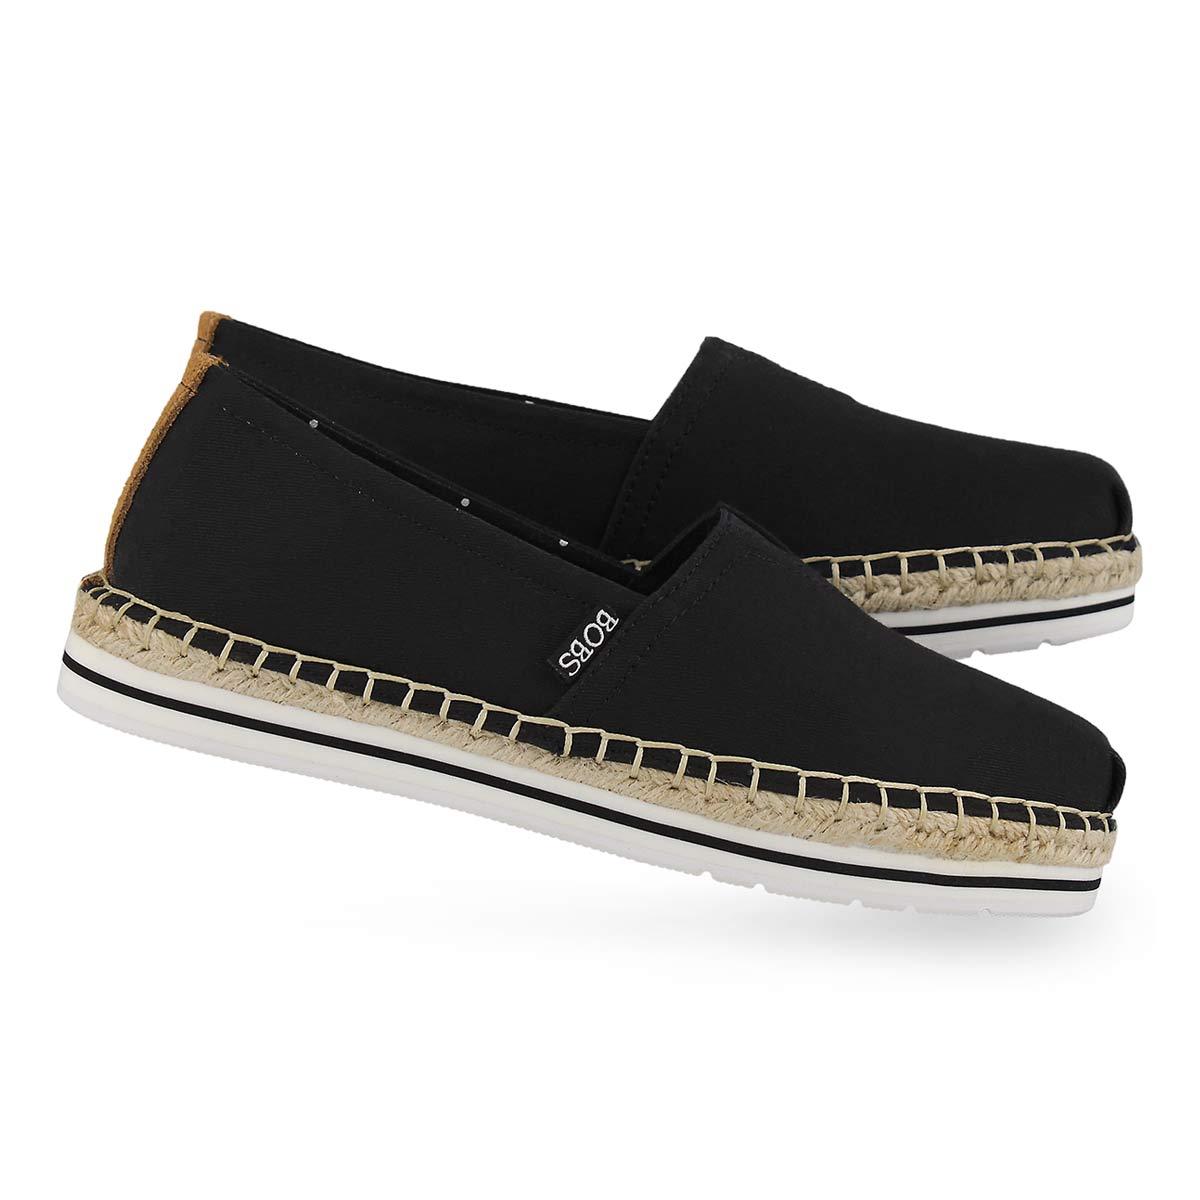 Lds Bobs Breeze blk slip on shoe